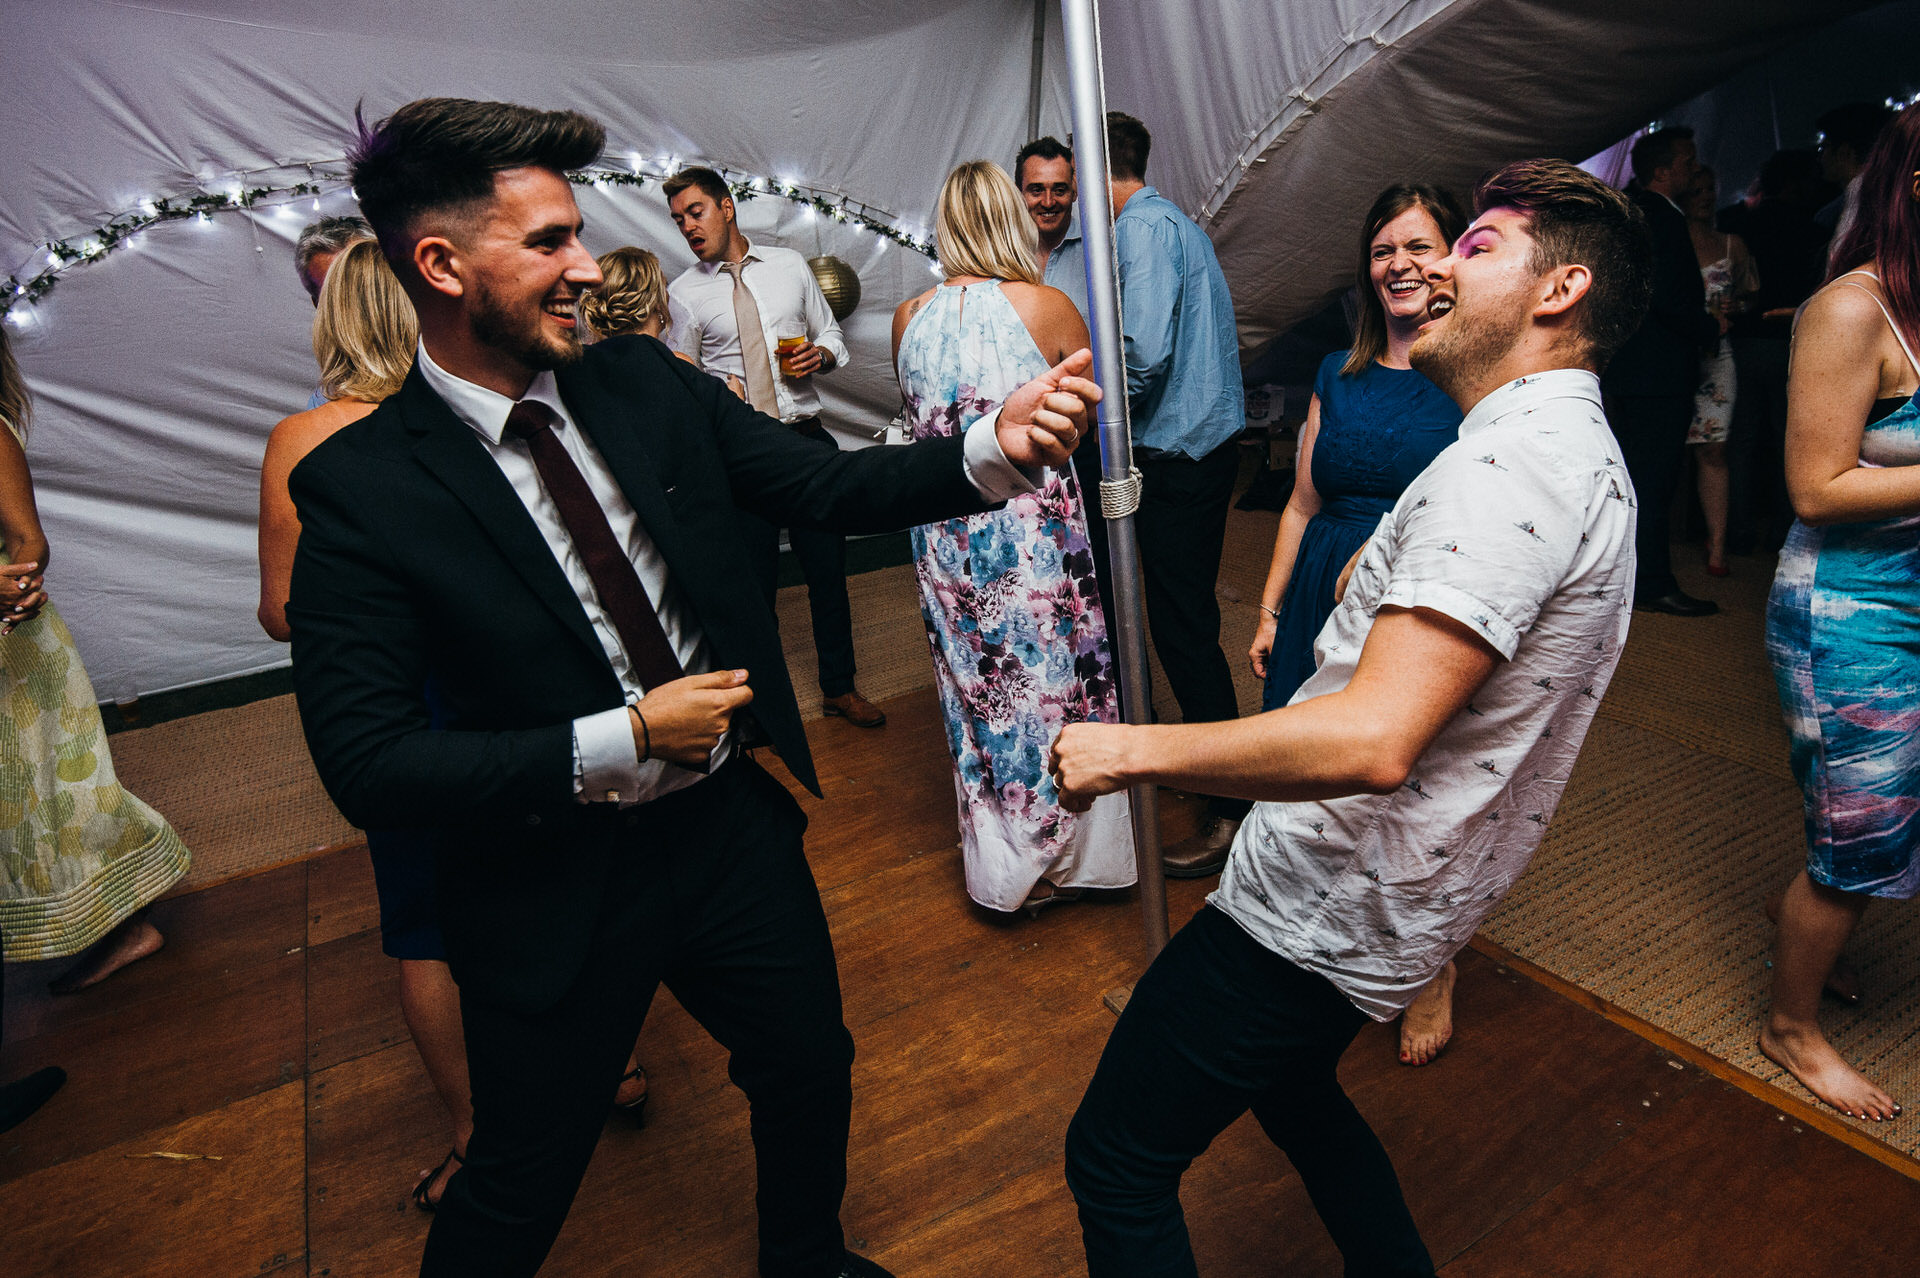 RHS Wisely wedding dancing